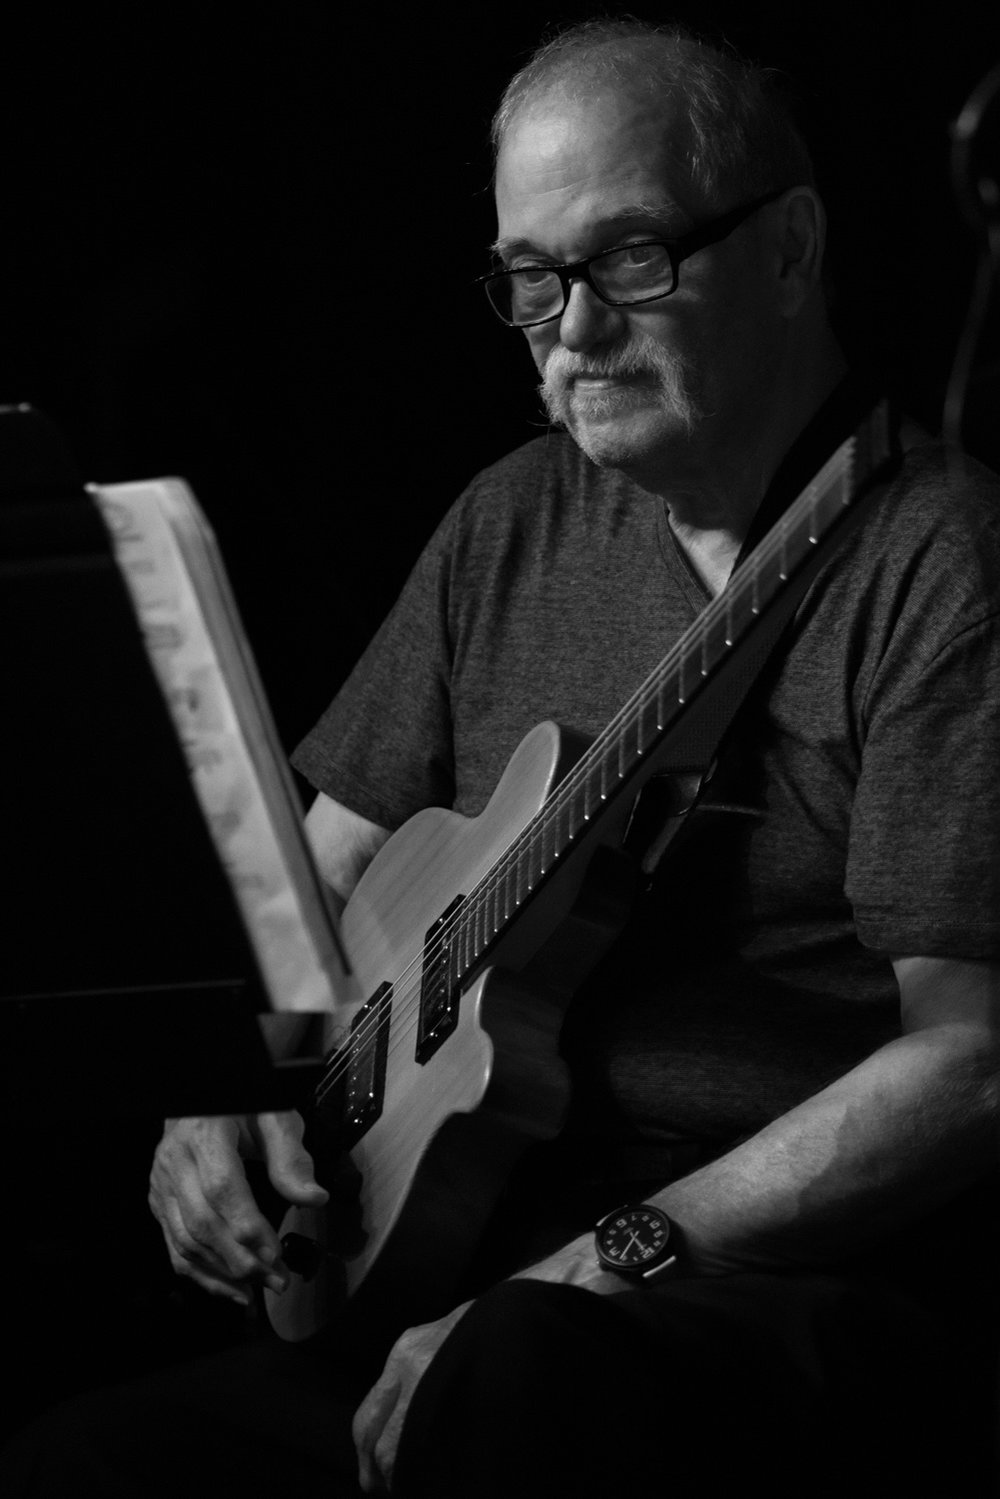 John Abercrombie, 2016